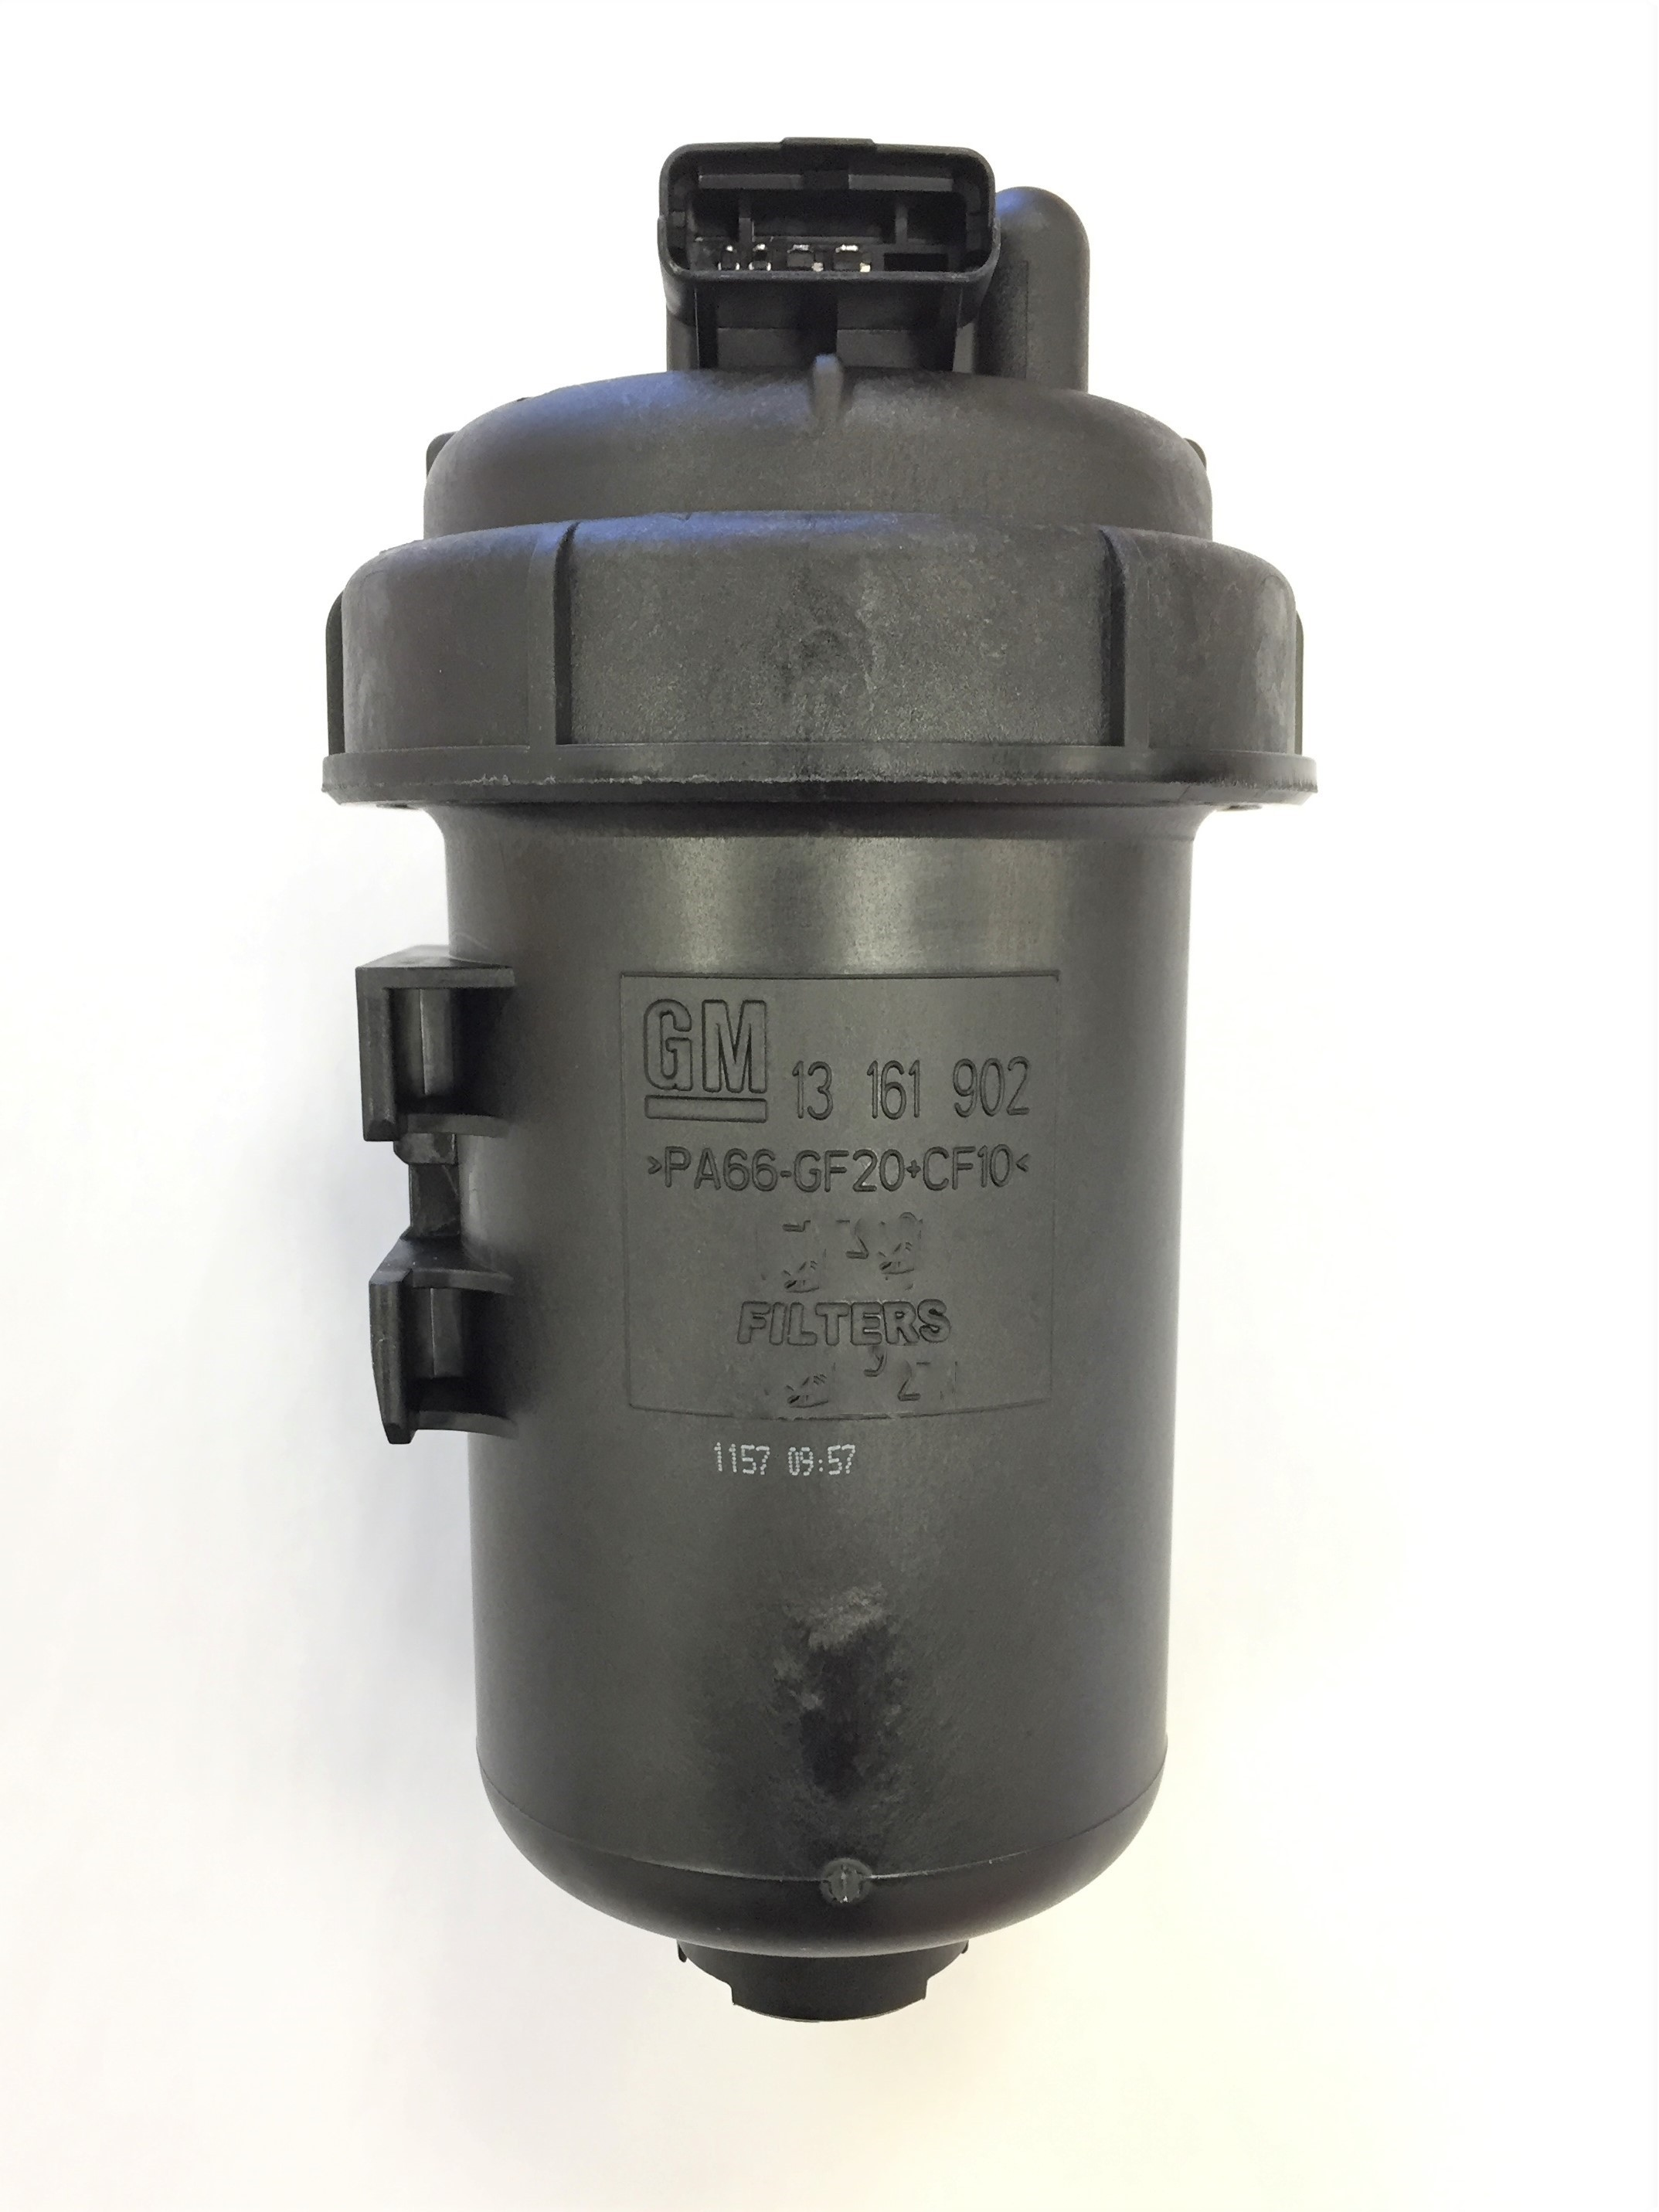 Suzuki Carry 1.3 Genuine Fram Engine Oil Filter Service Replacement